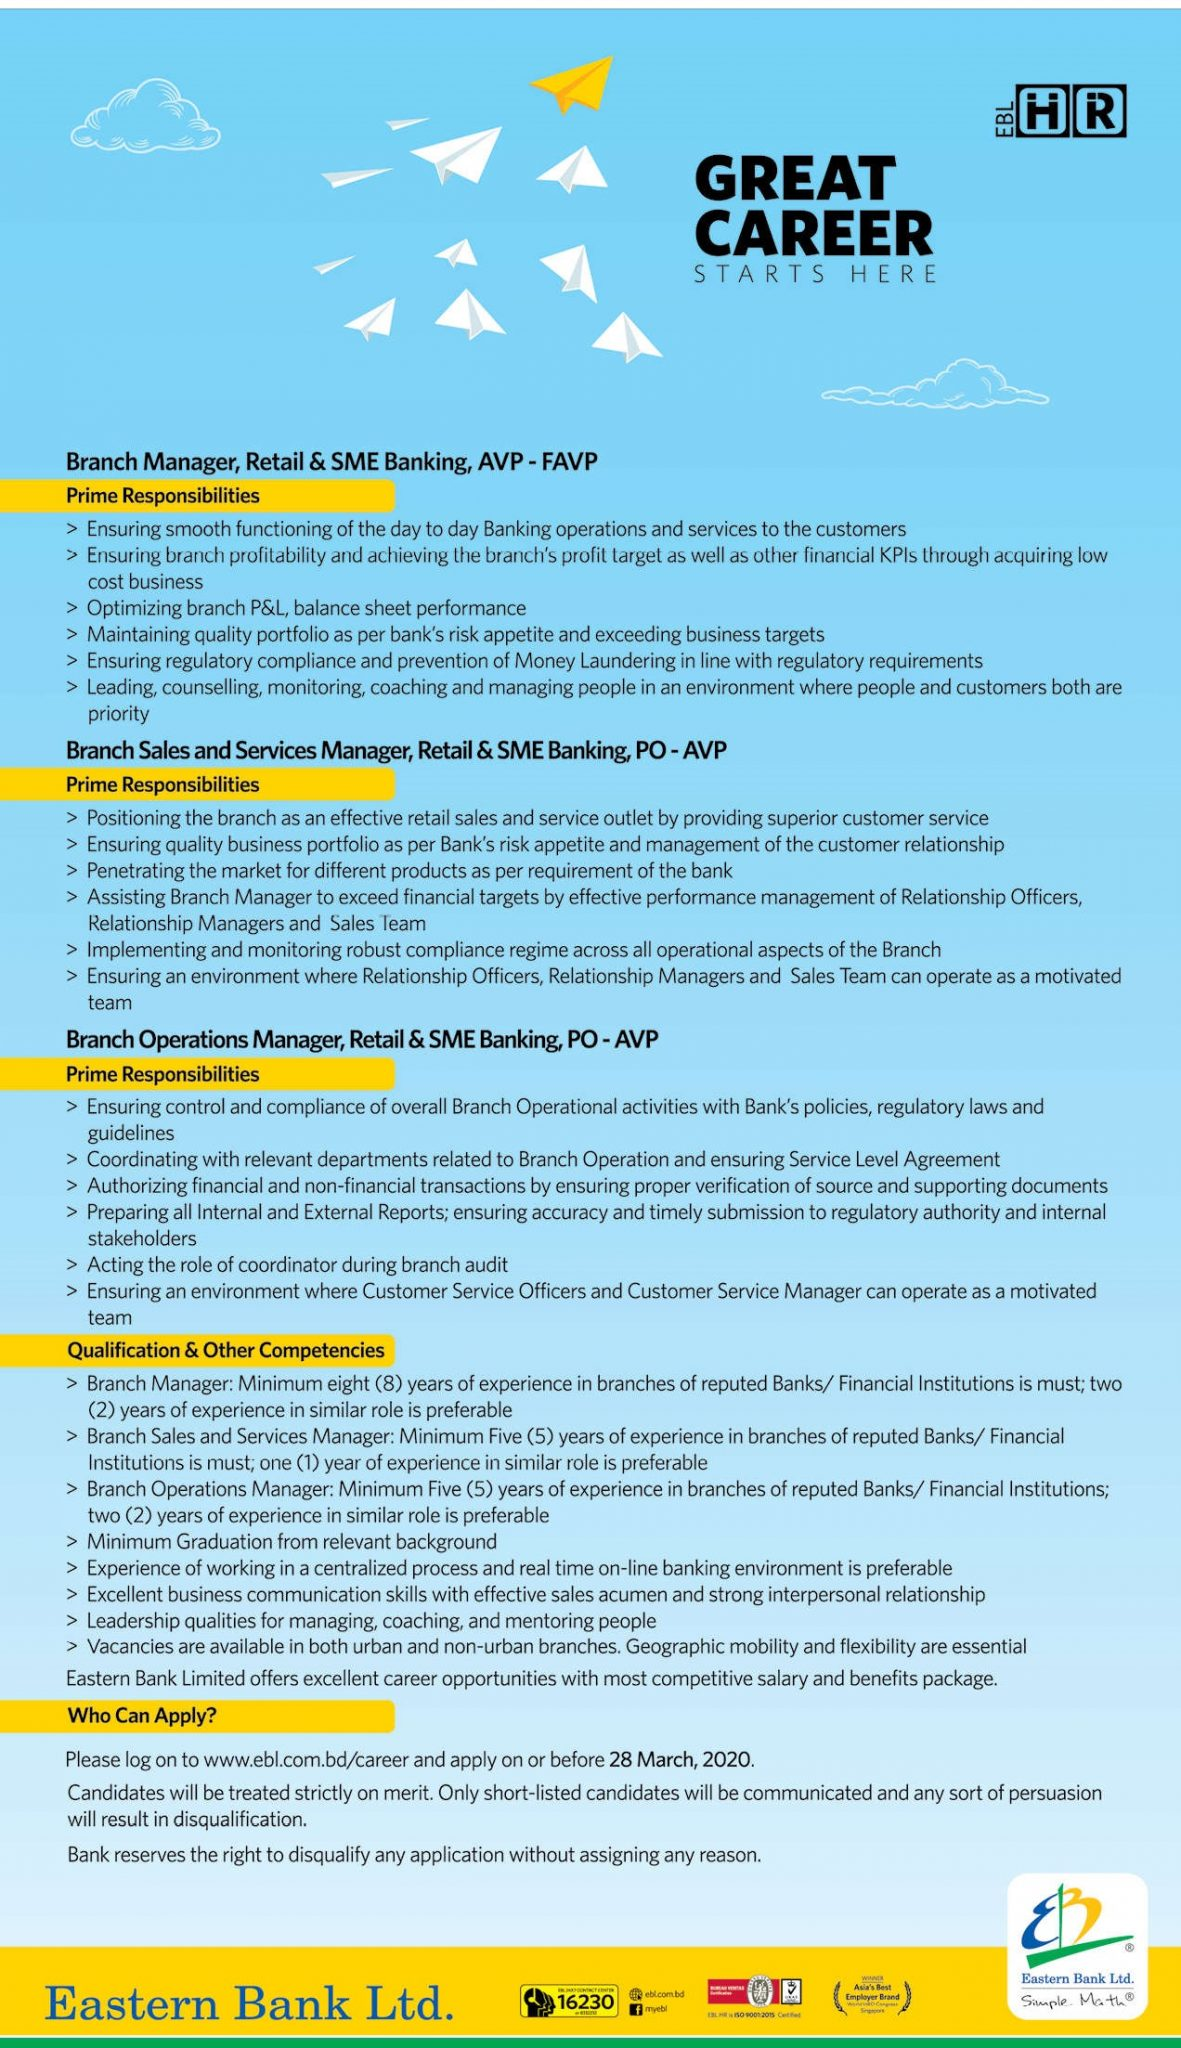 Eastern Bank Limited Job Circular 2020